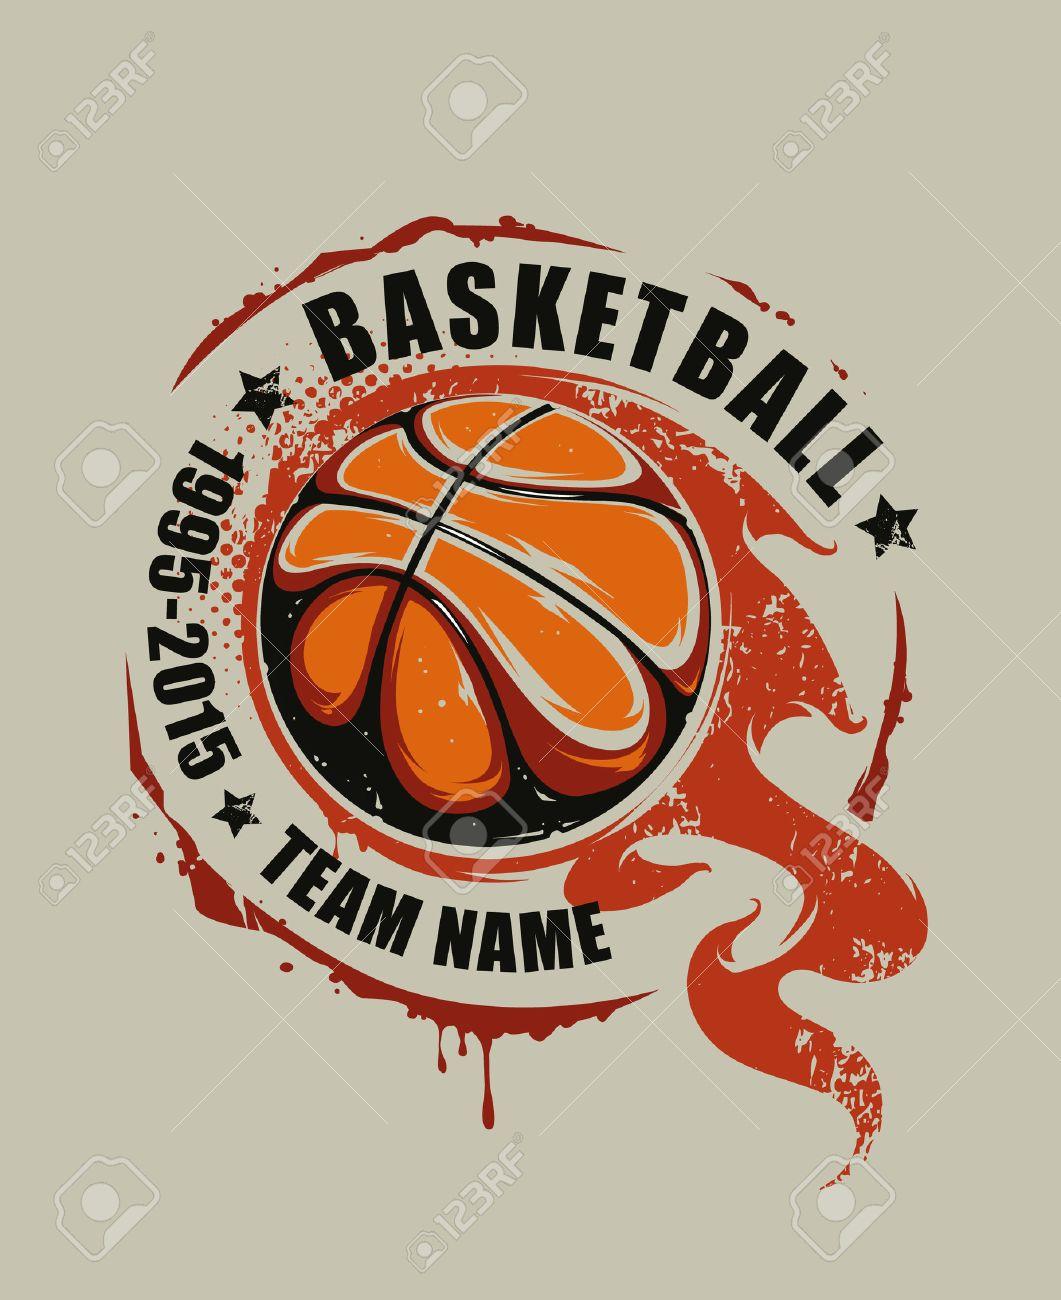 Graffiti Design Basketball